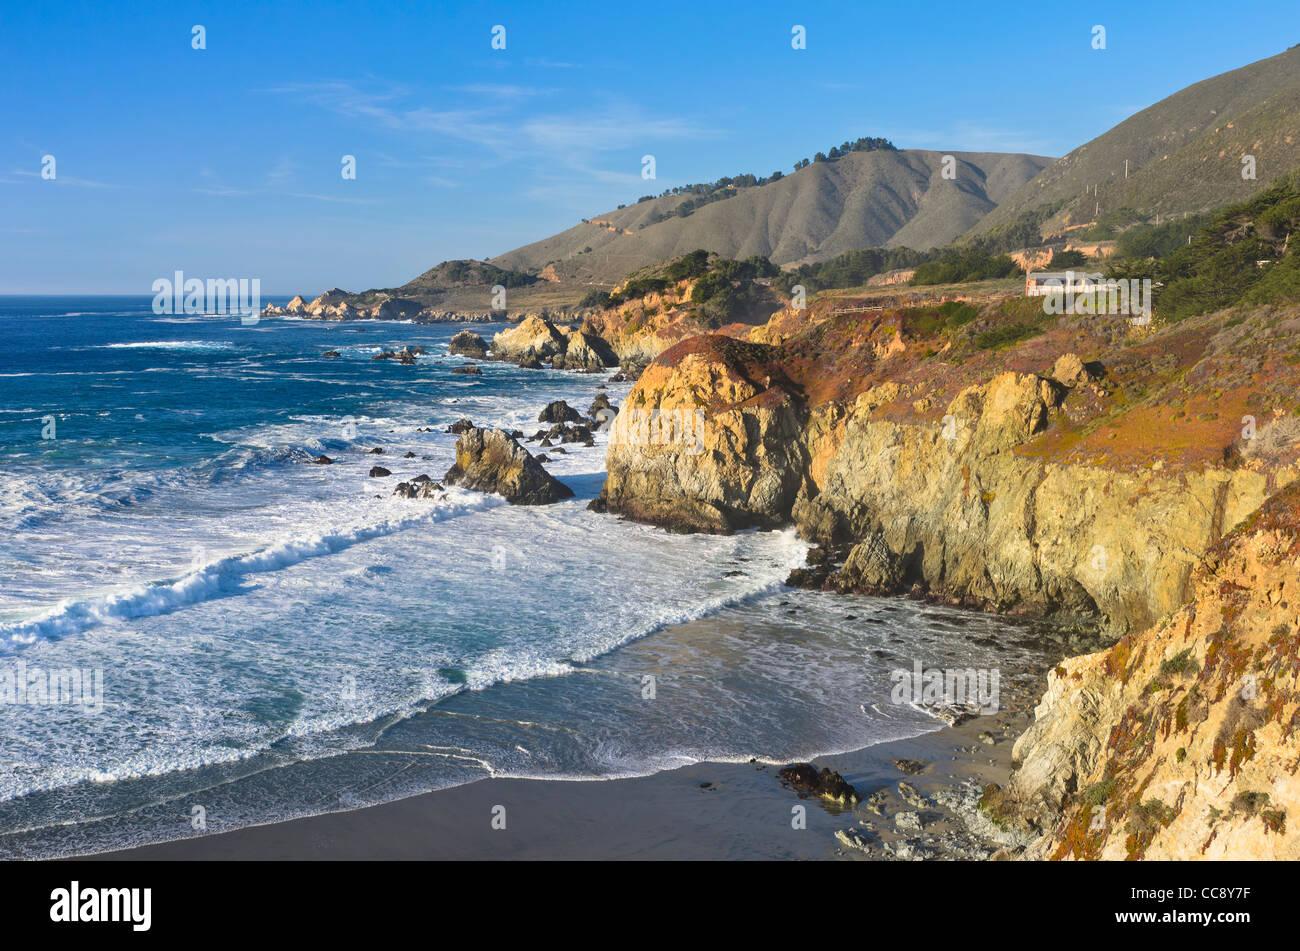 Central Coast, Big Sur near Monterey, California - Stock Image